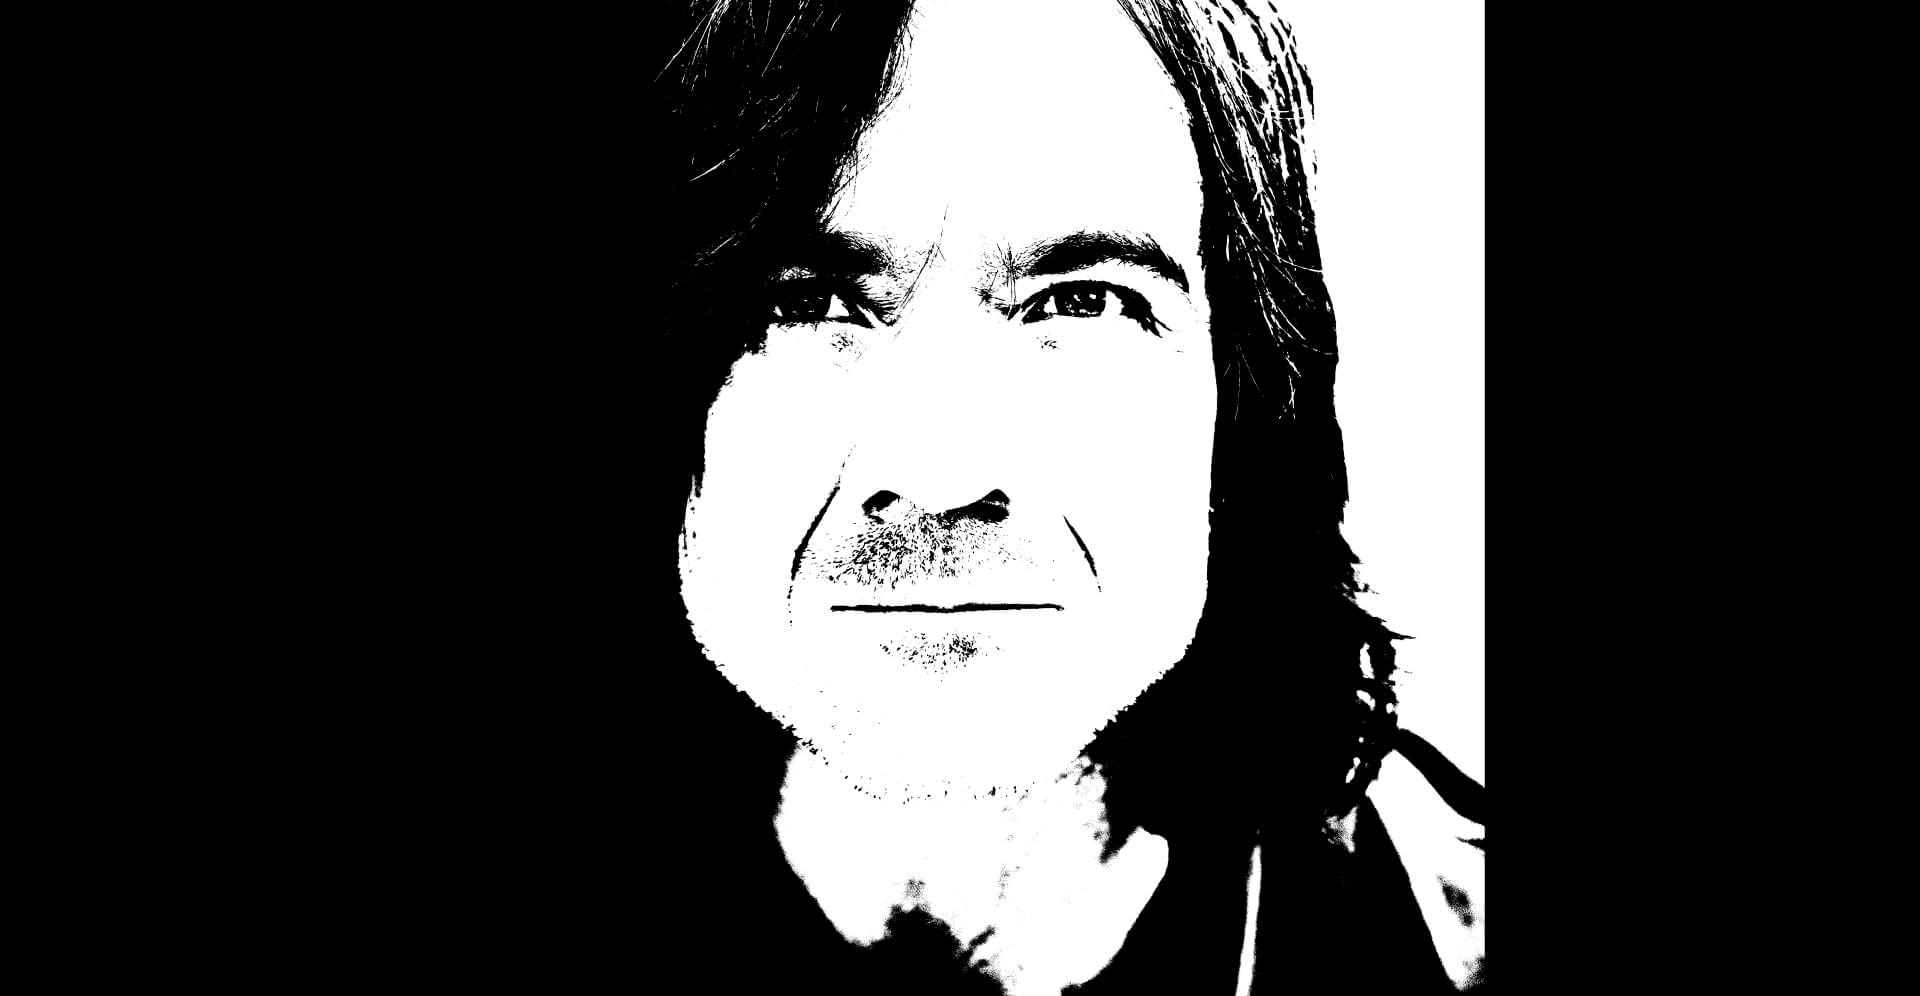 JPM Portrait